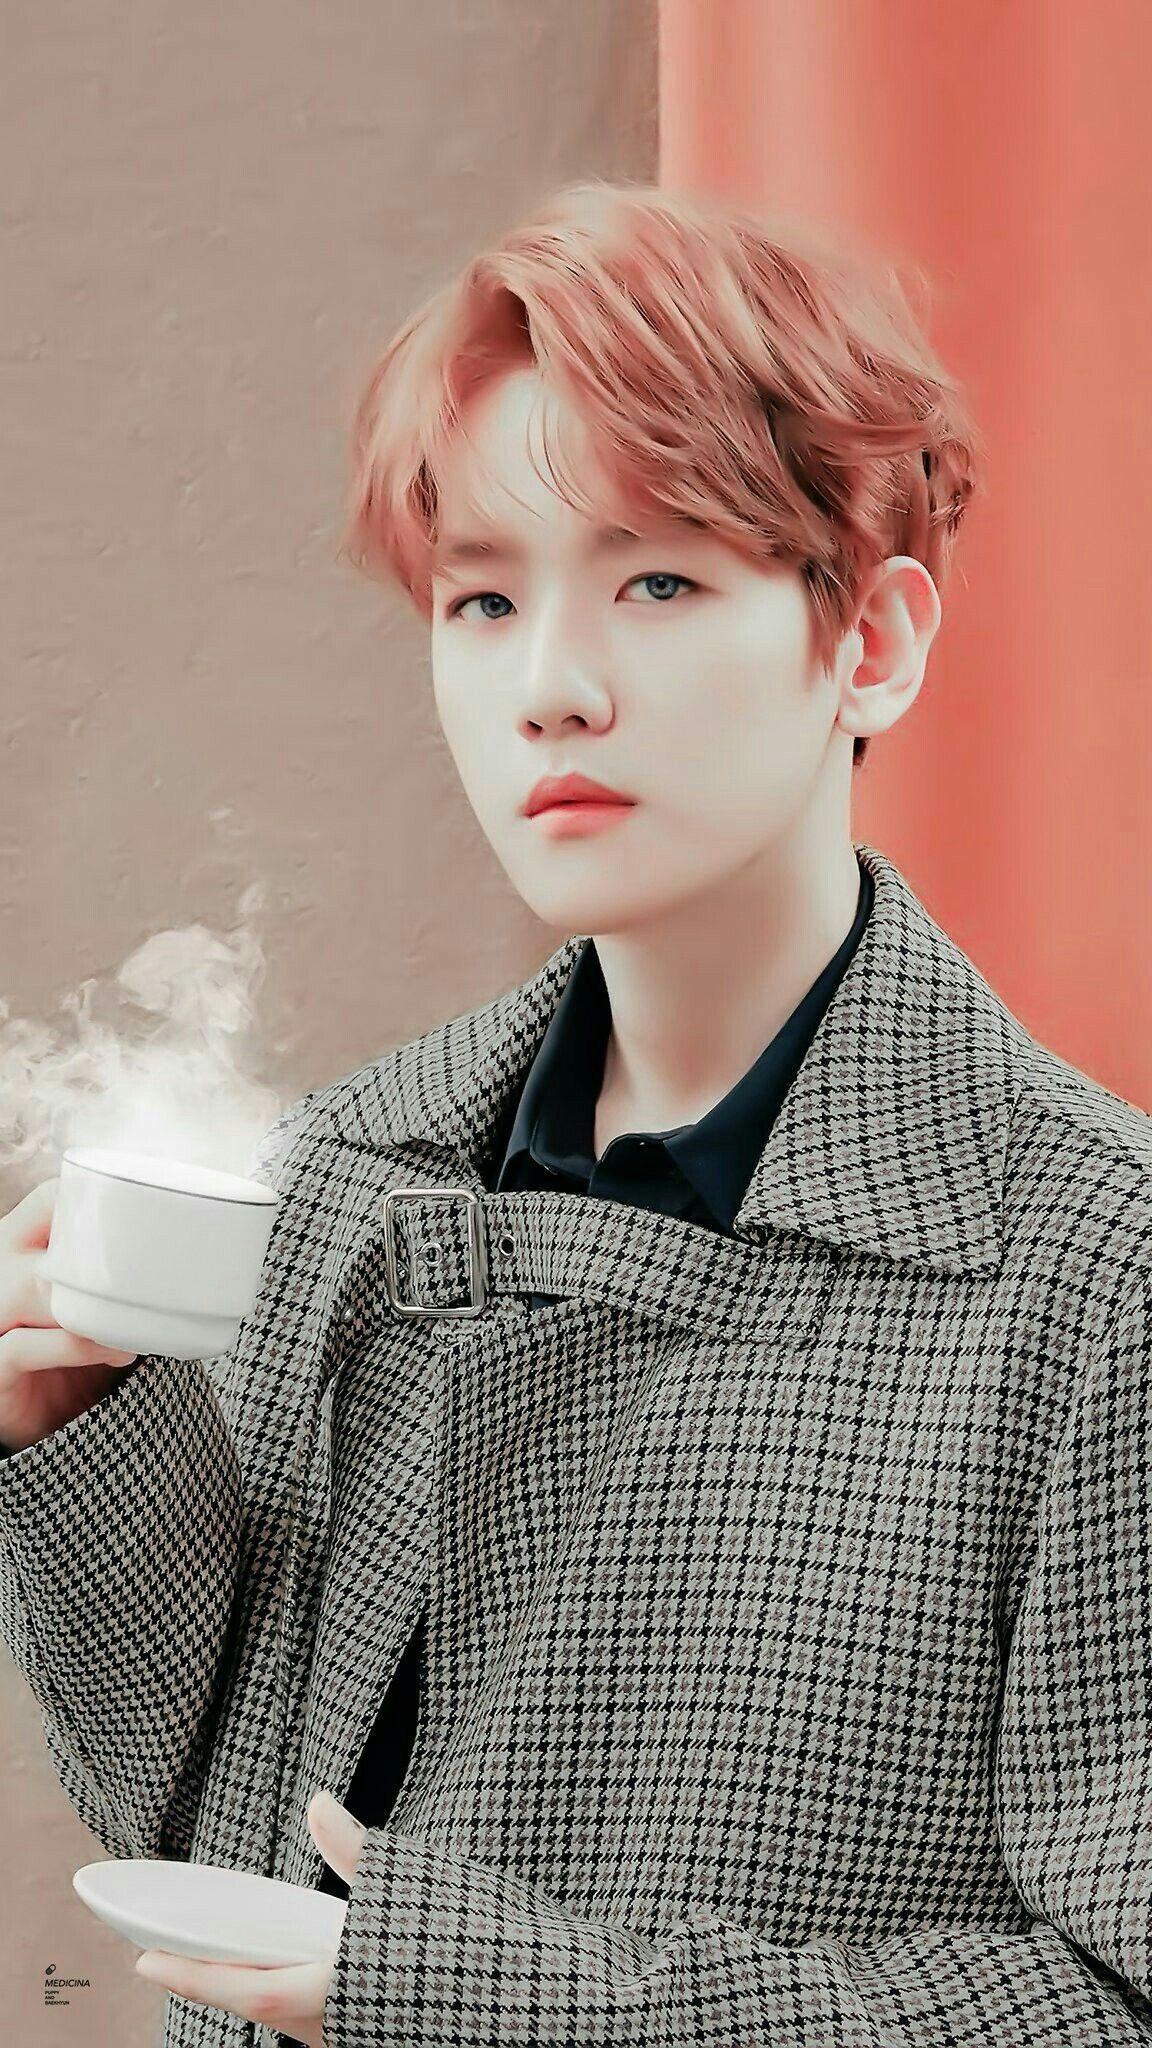 Exo Baekhyun Wallpapers Top Free Exo Baekhyun Backgrounds